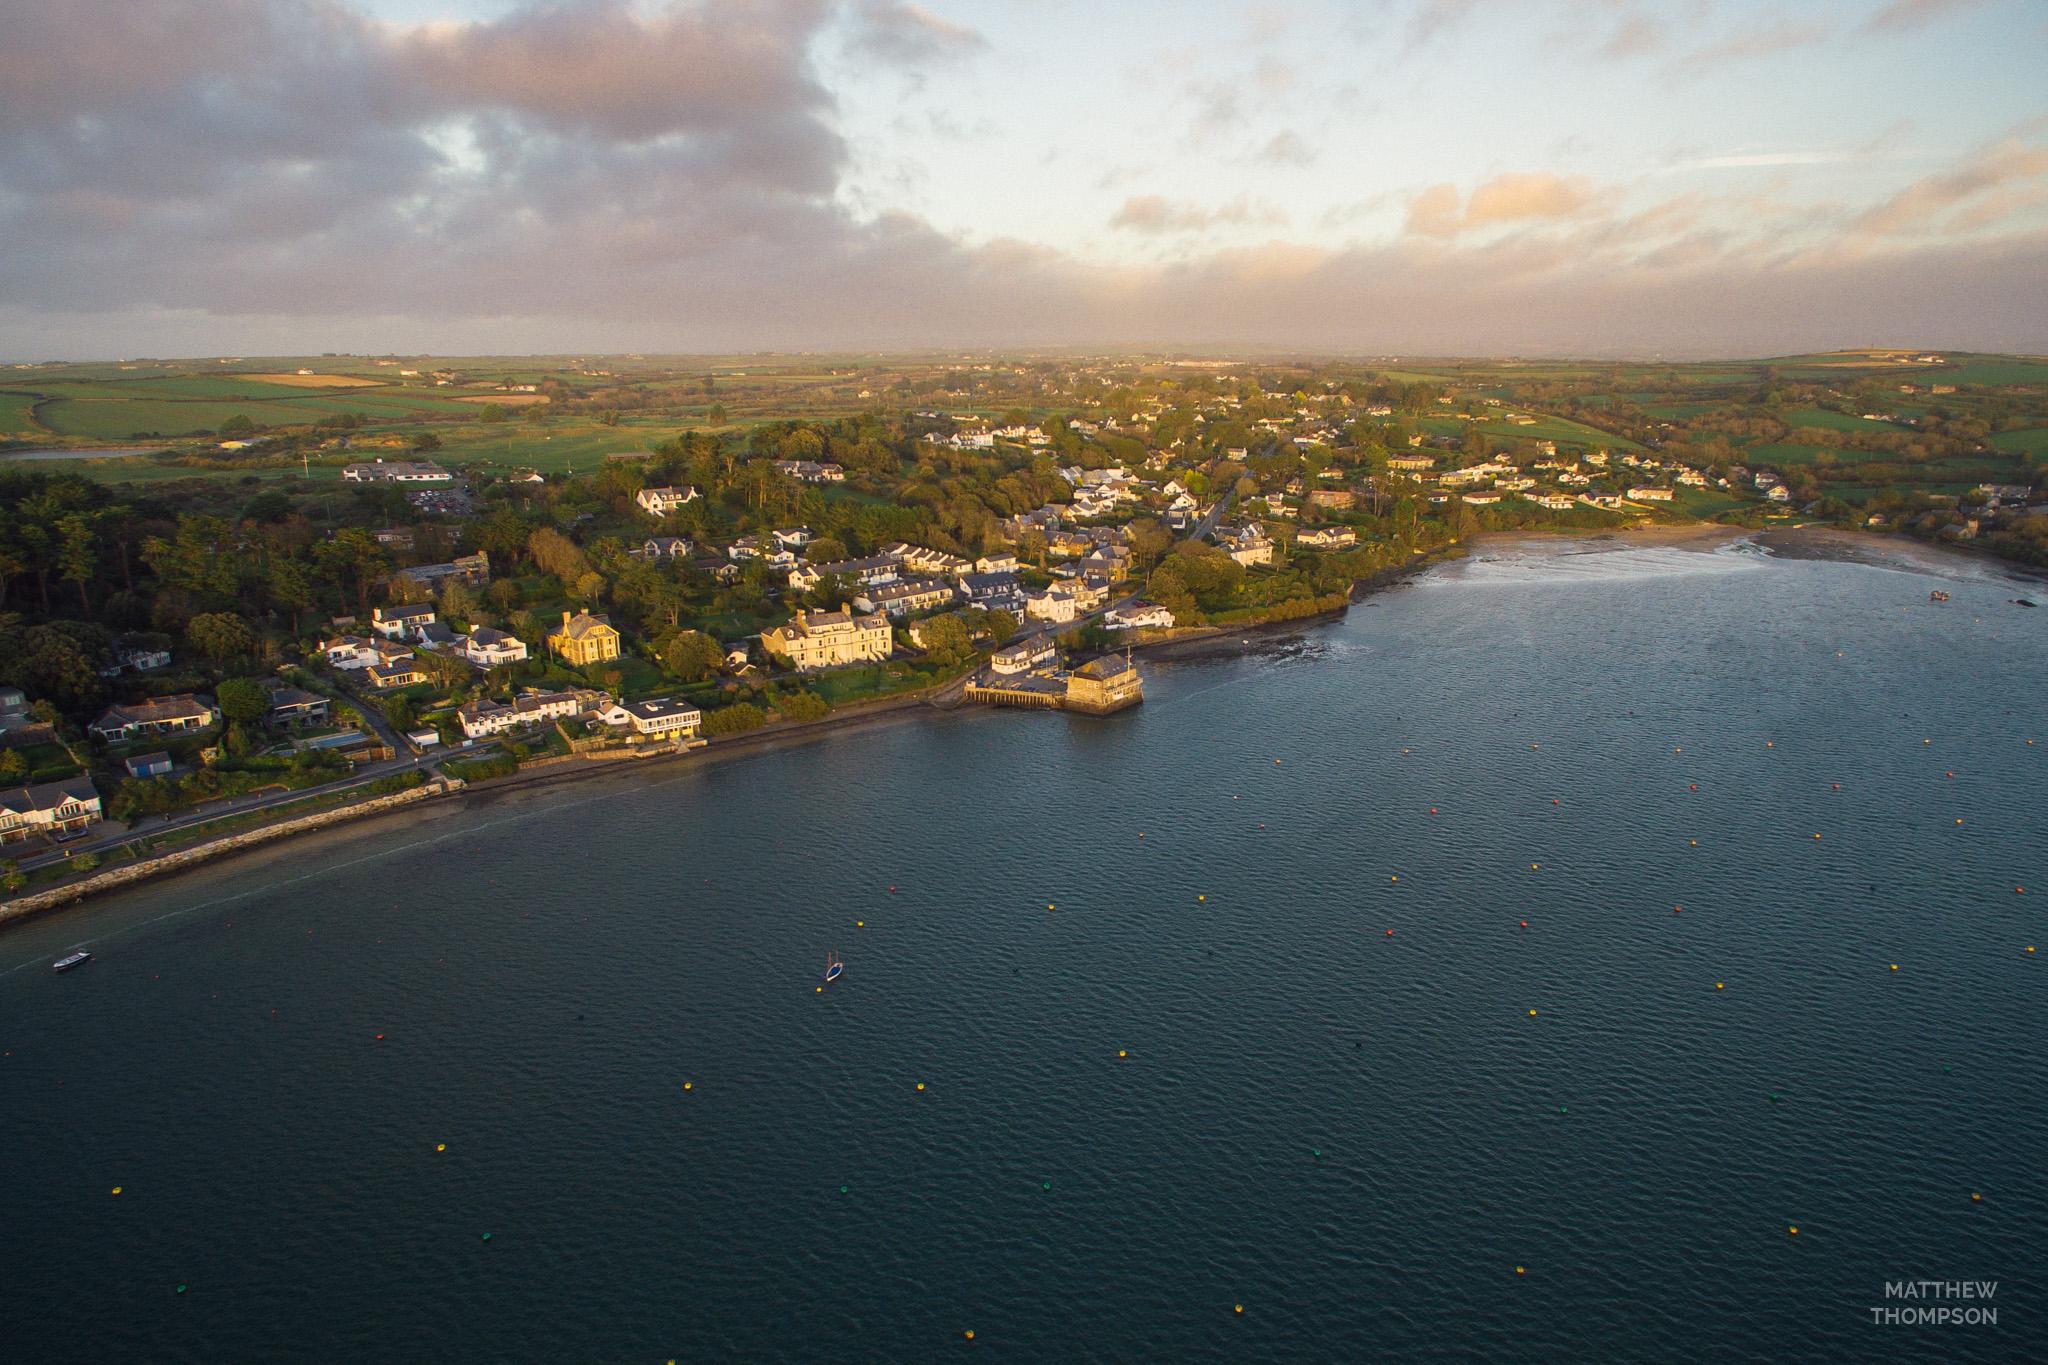 151107-Cornwall-Aerial-21-W.jpg